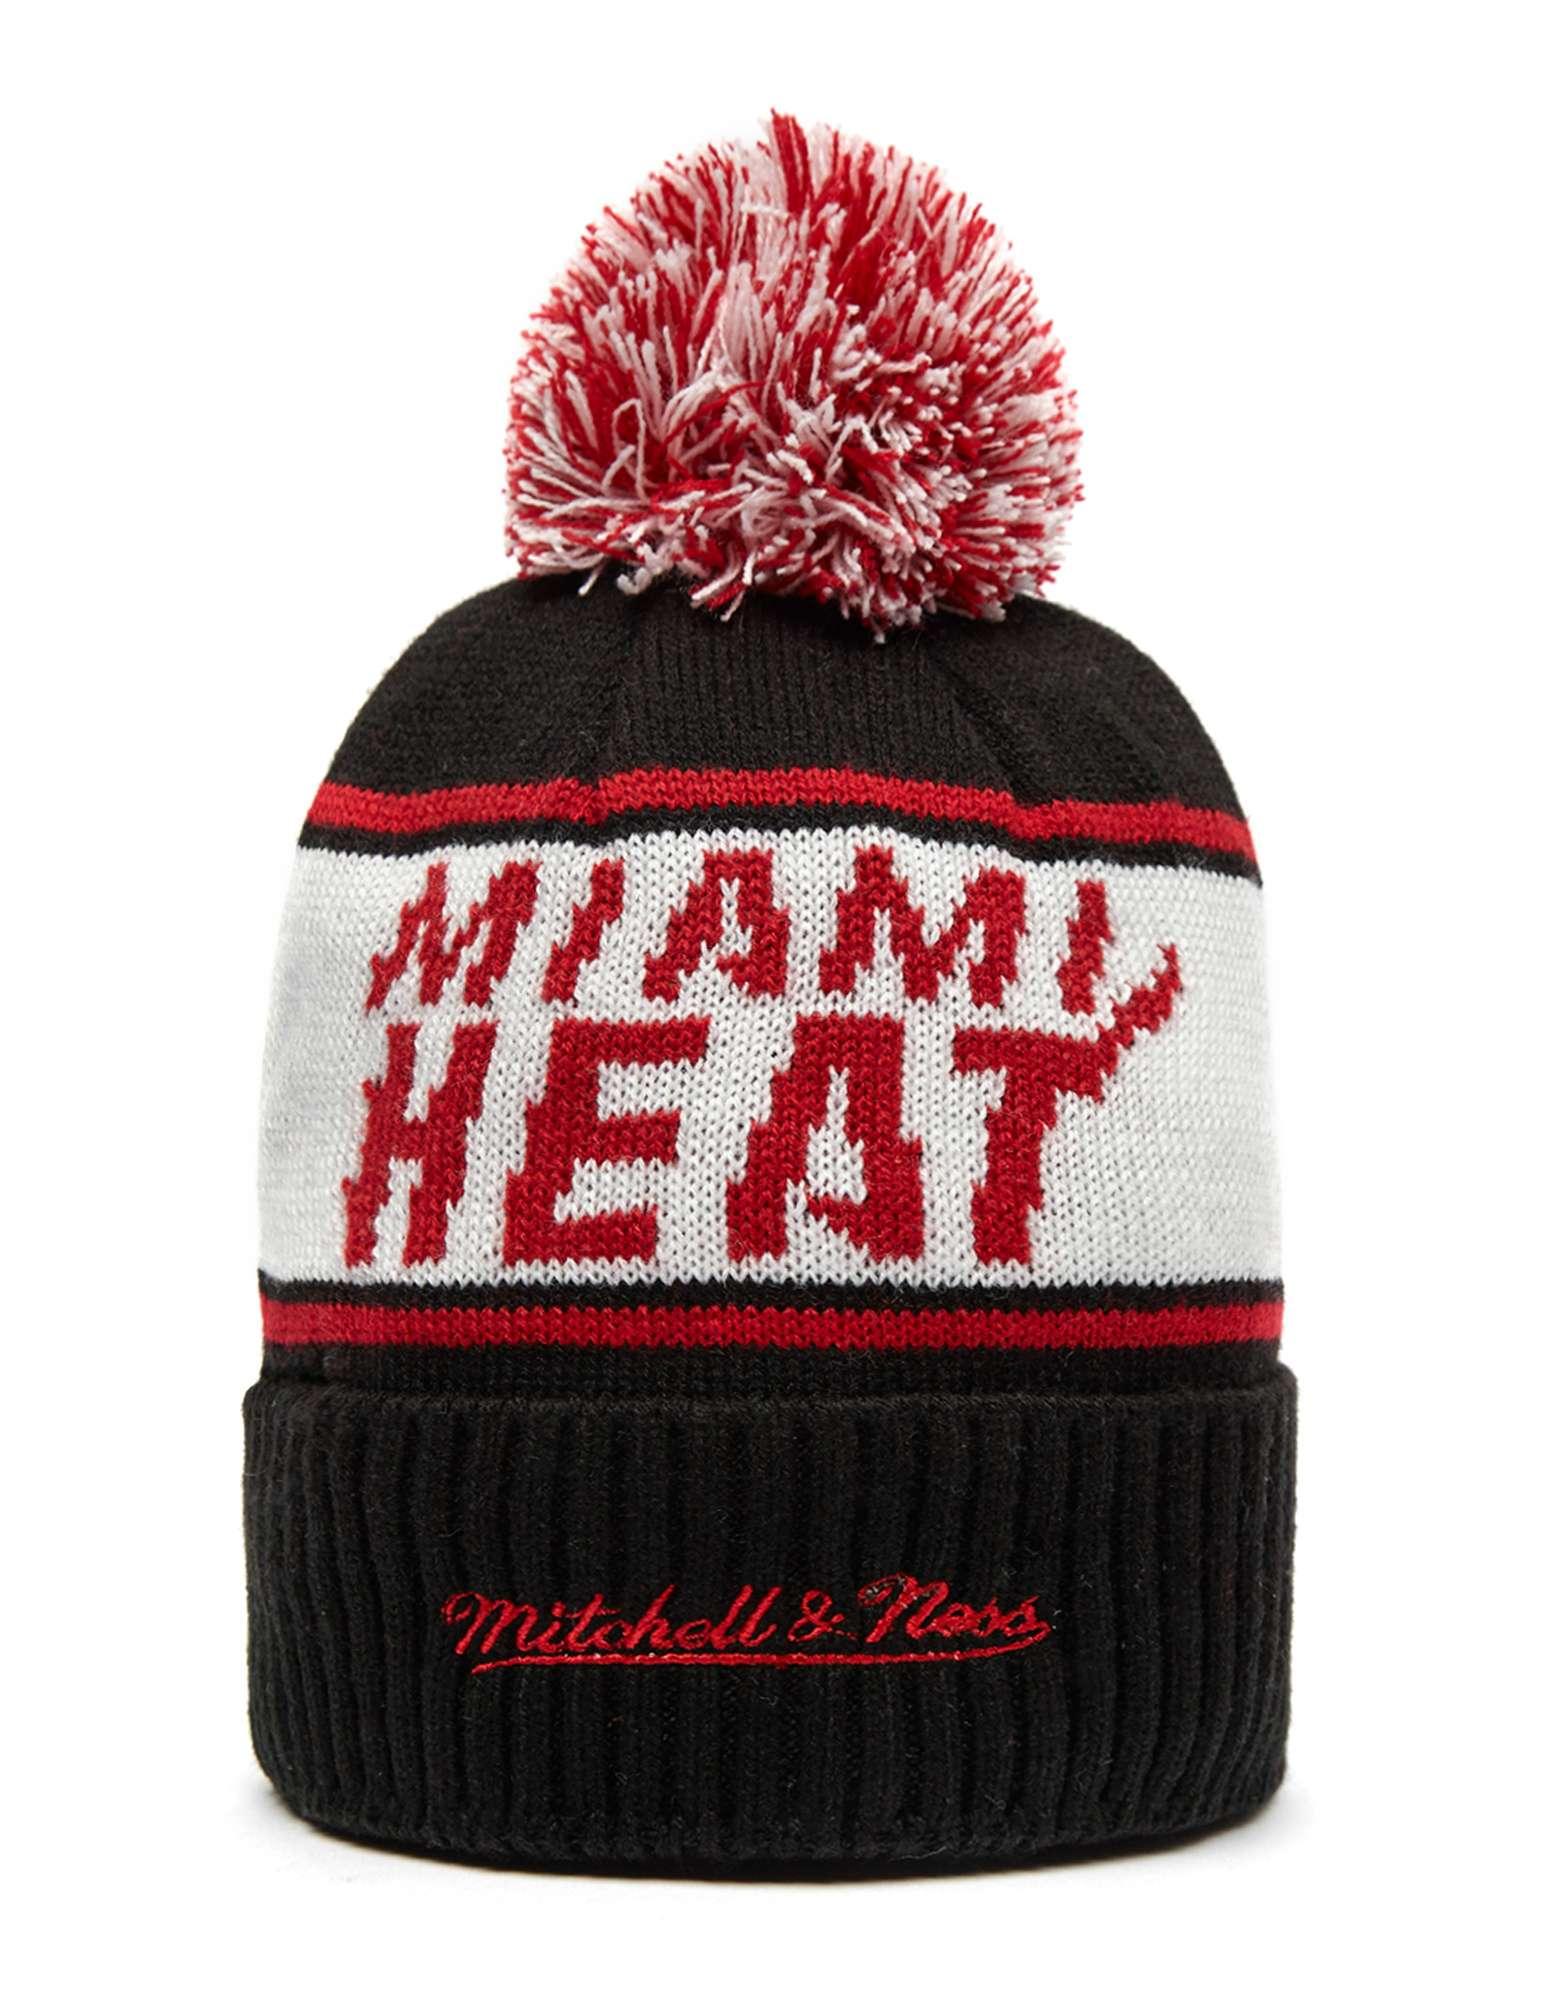 Mitchell & Ness NBA Miami Heat Wordmark Bobble Hat